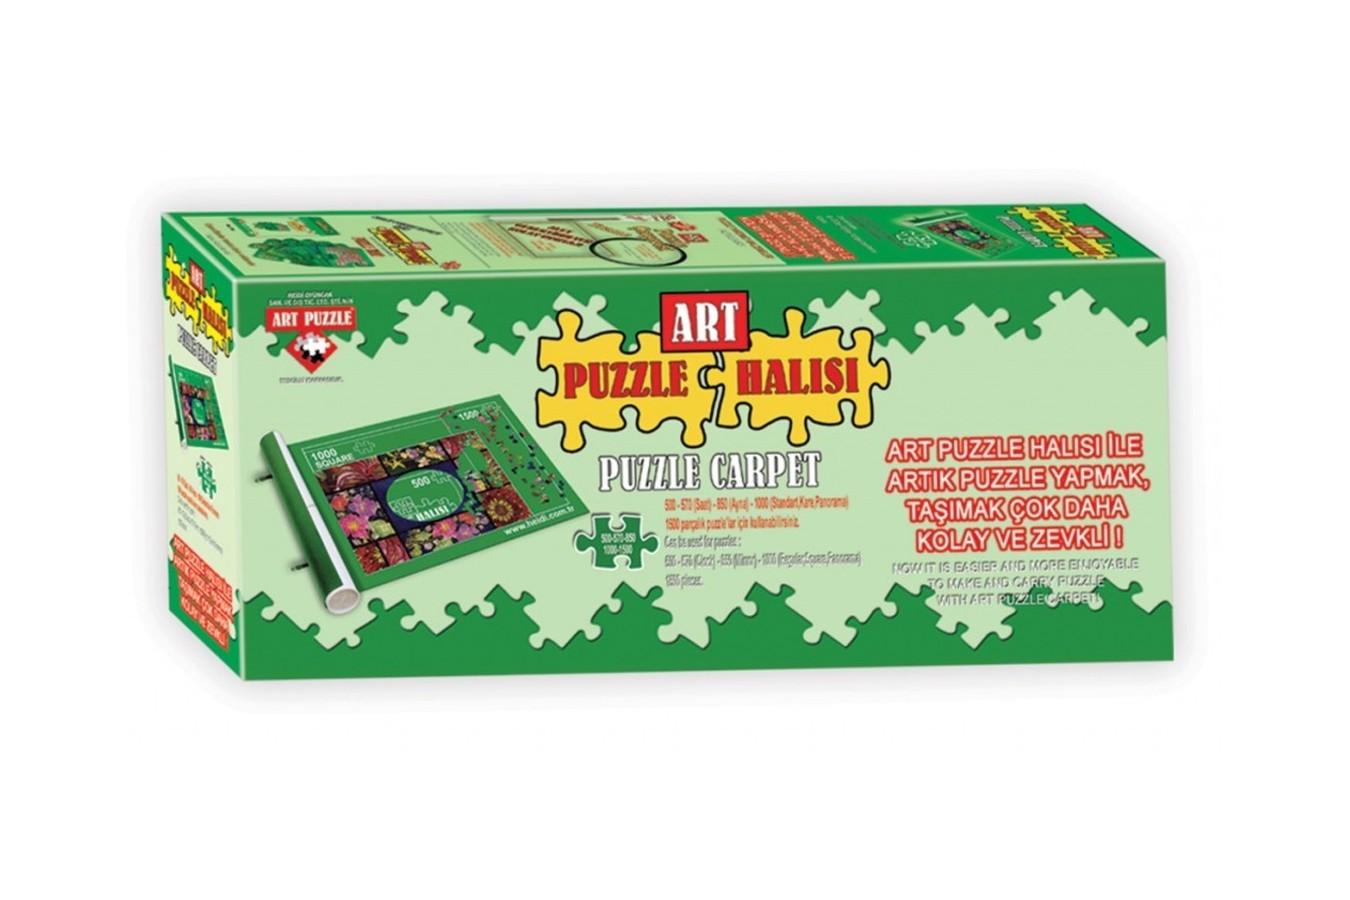 Covor Pentru Puzzle Art Puzzle, 100-1500 piese imagine